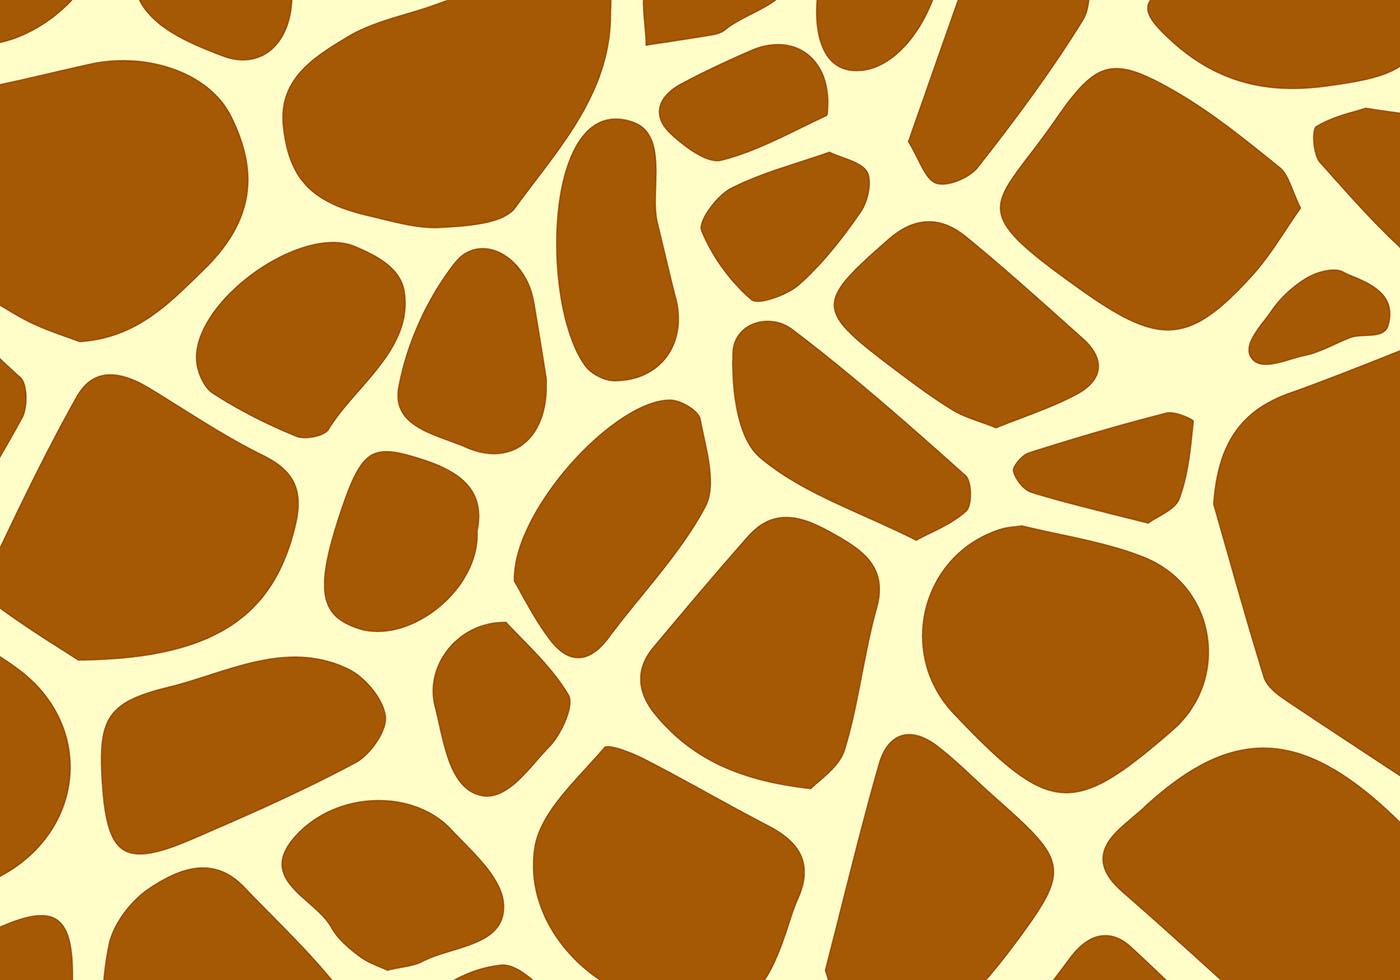 giraffe pattern vector download free vector art  stock leopard print vector pattern leopard print vector art